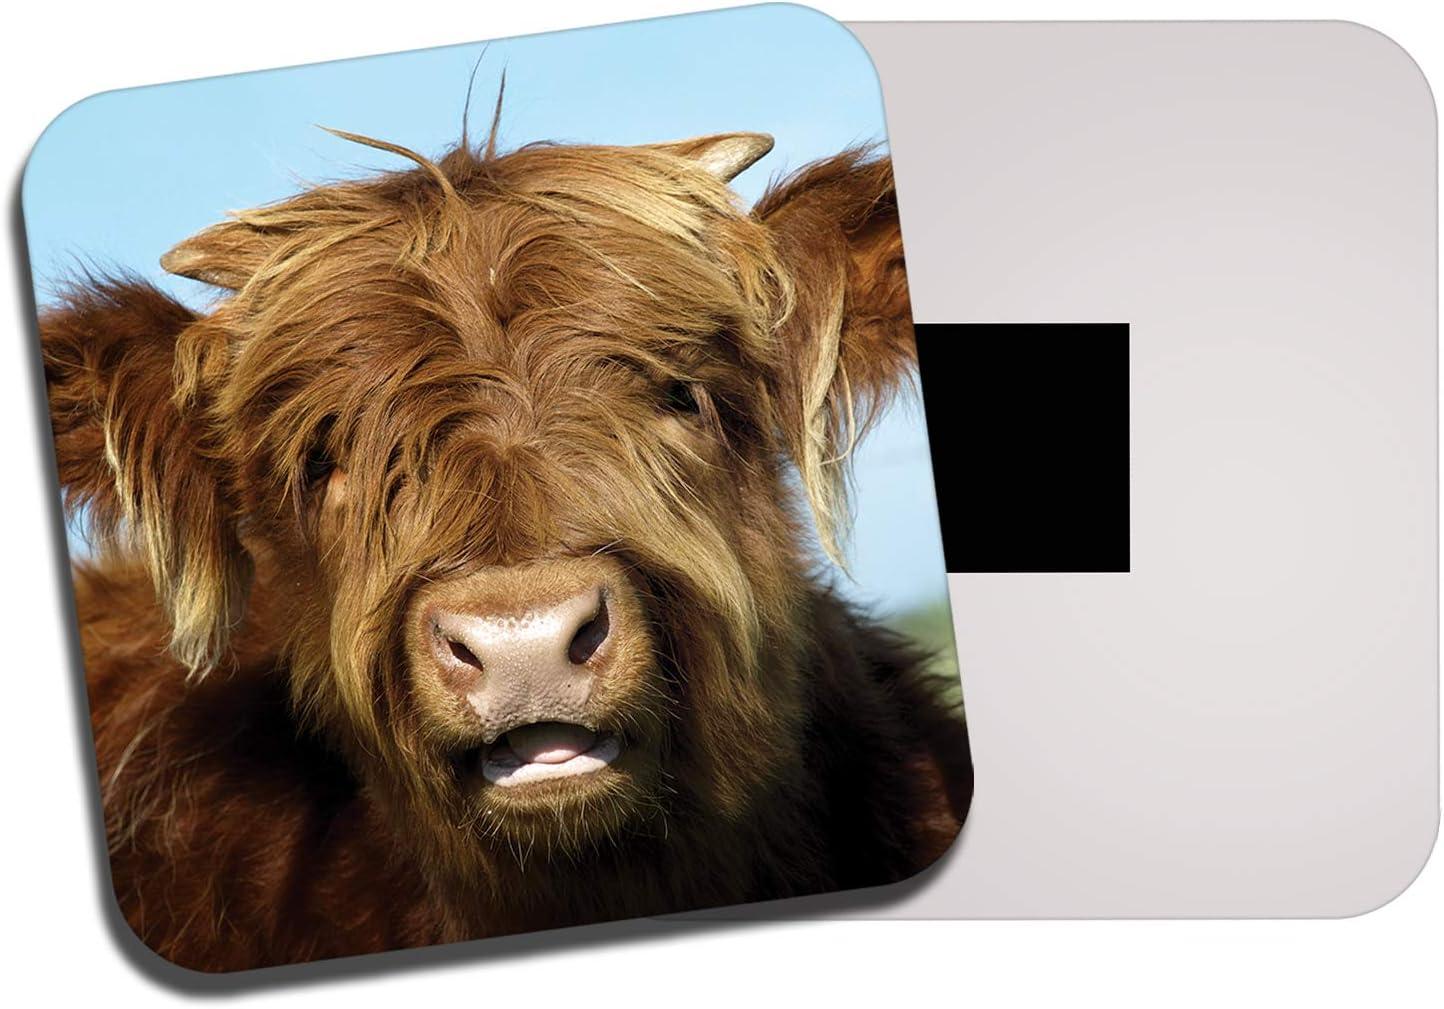 DestinationVinyl Ginger Highland Cow Fridge Magnet - Cattle Funny Scotland Animal 8234